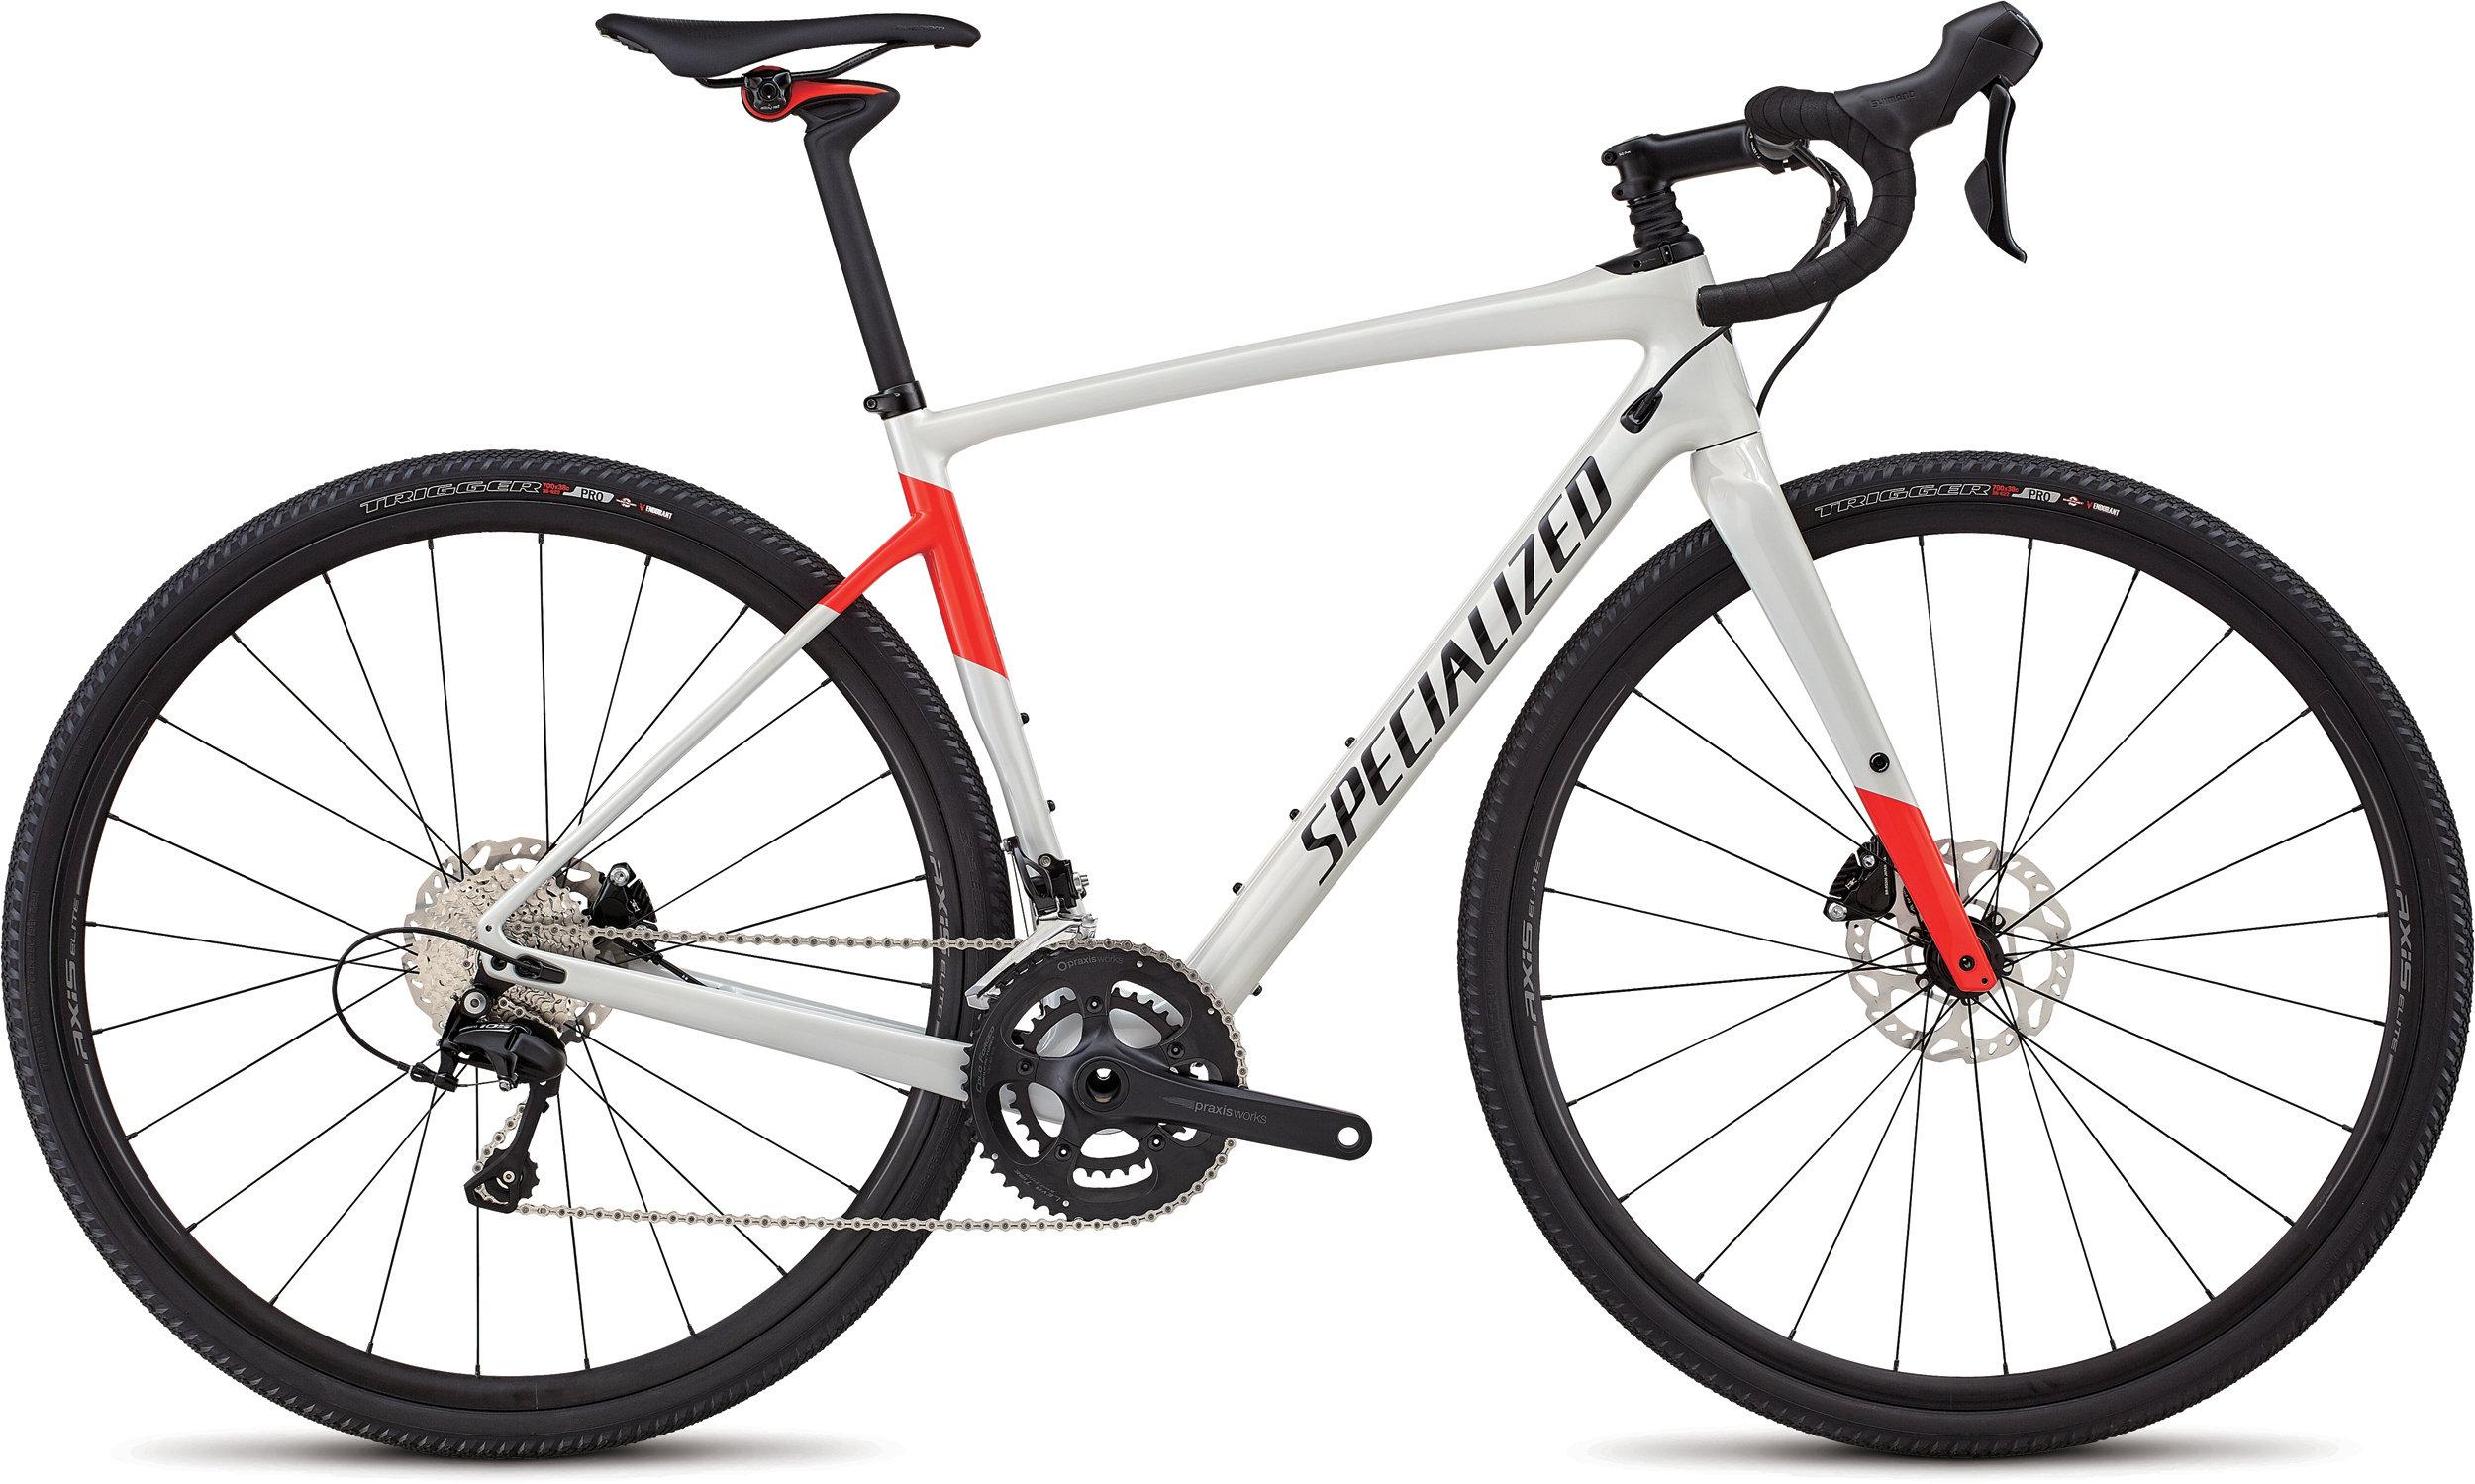 Specialized Men´s Diverge Comp Gloss Dirty White/Rocket Red/Tarmac Black 48 - Bartz Bikesystem & Velodepot